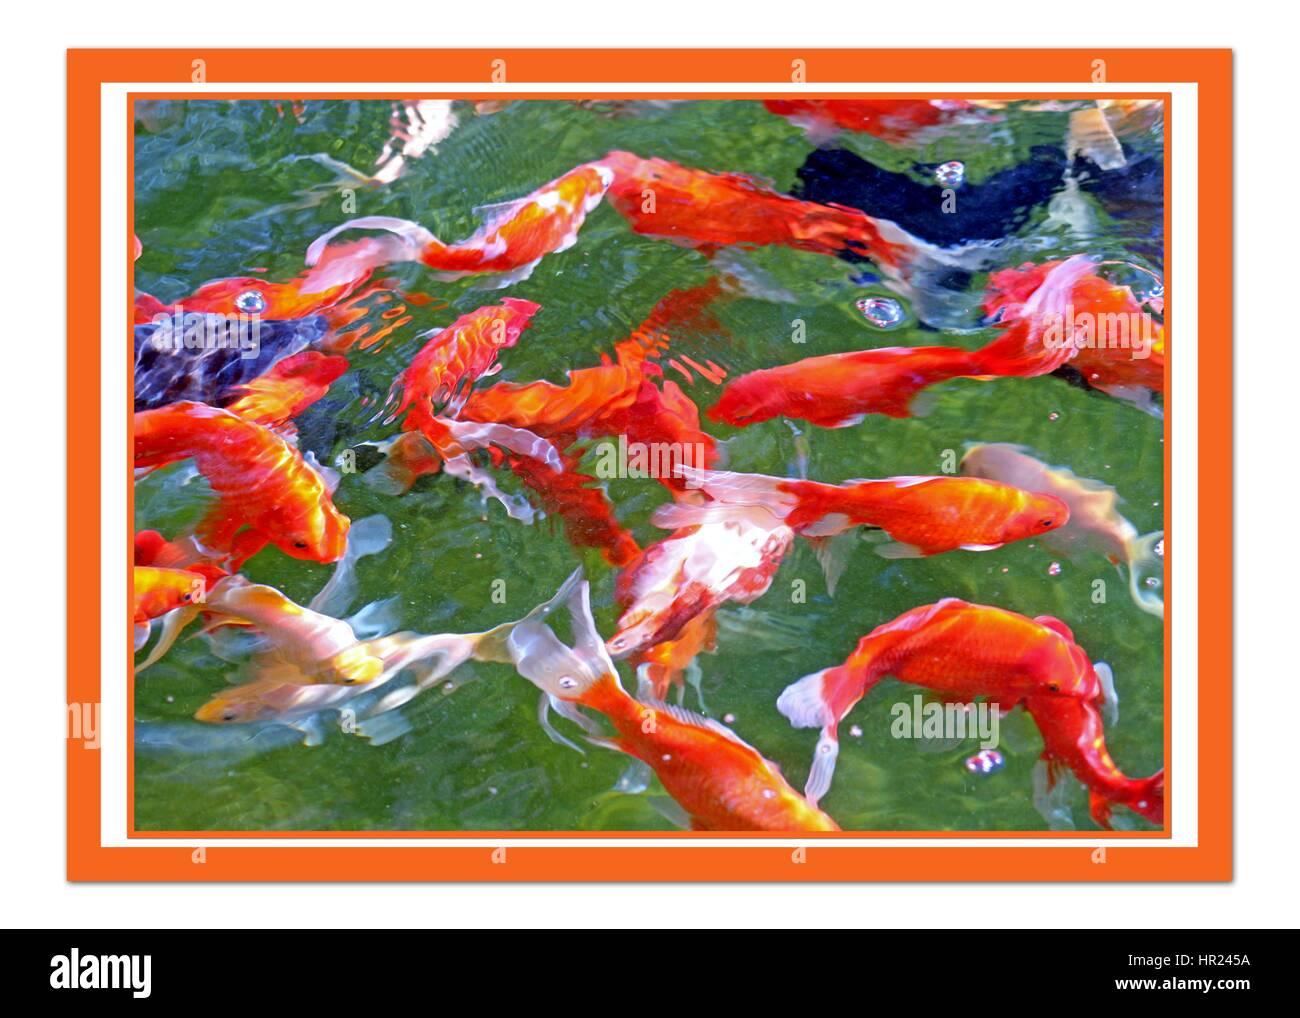 Long Thin Fish Stock Photos & Long Thin Fish Stock Images - Alamy